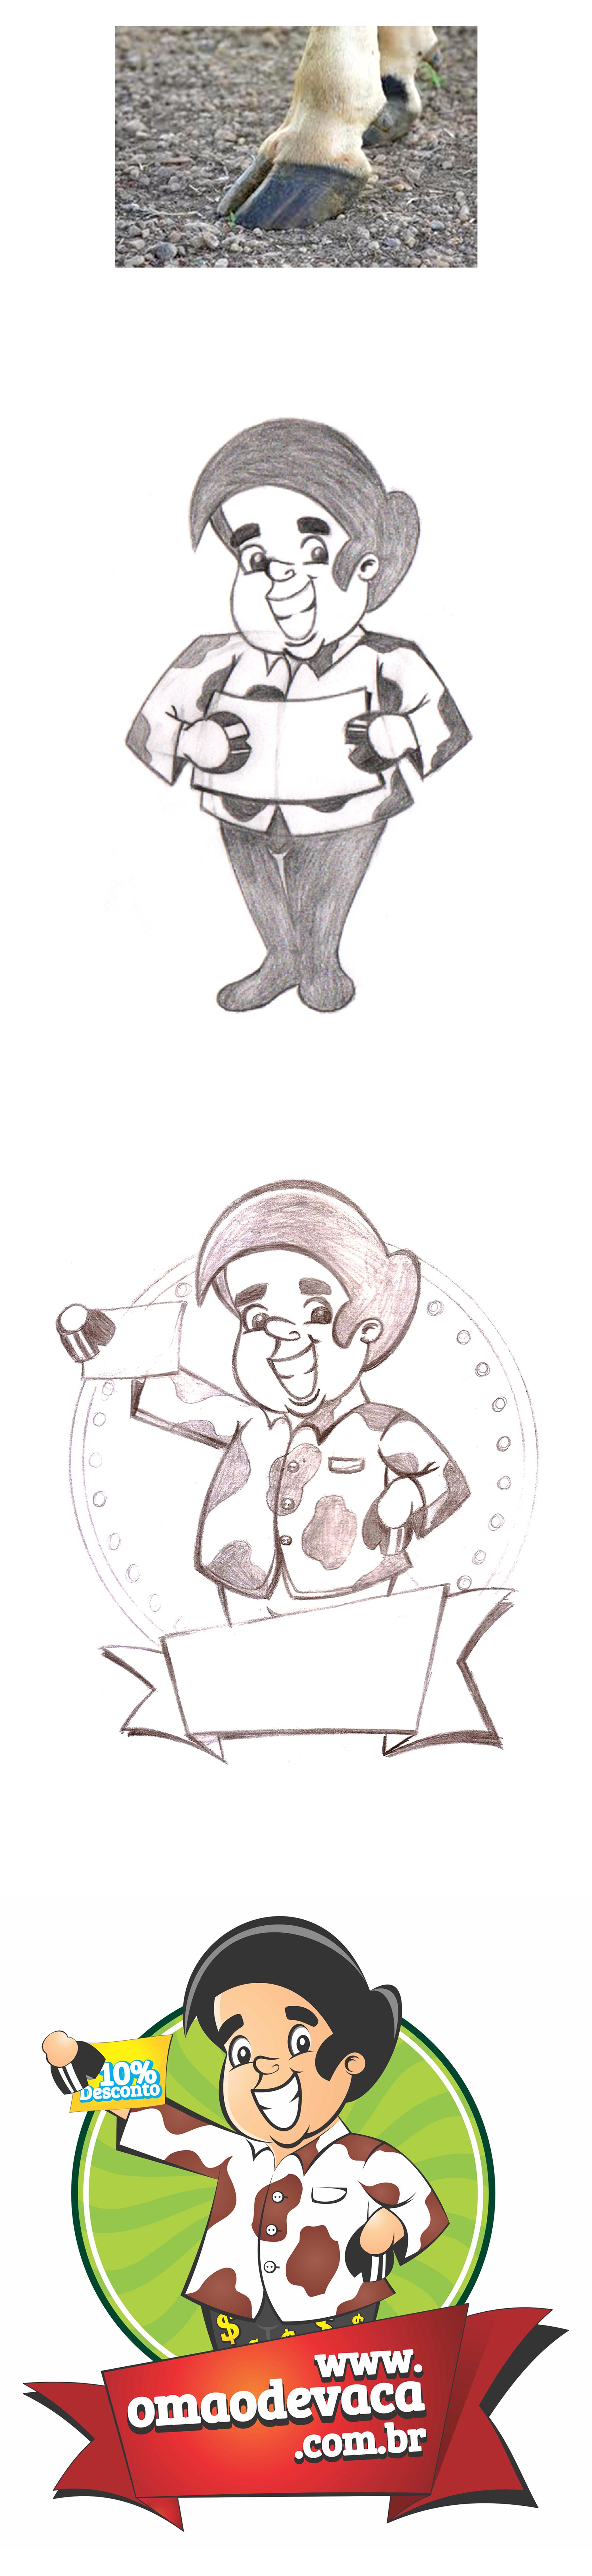 Conceito Mascote o mao de vaca